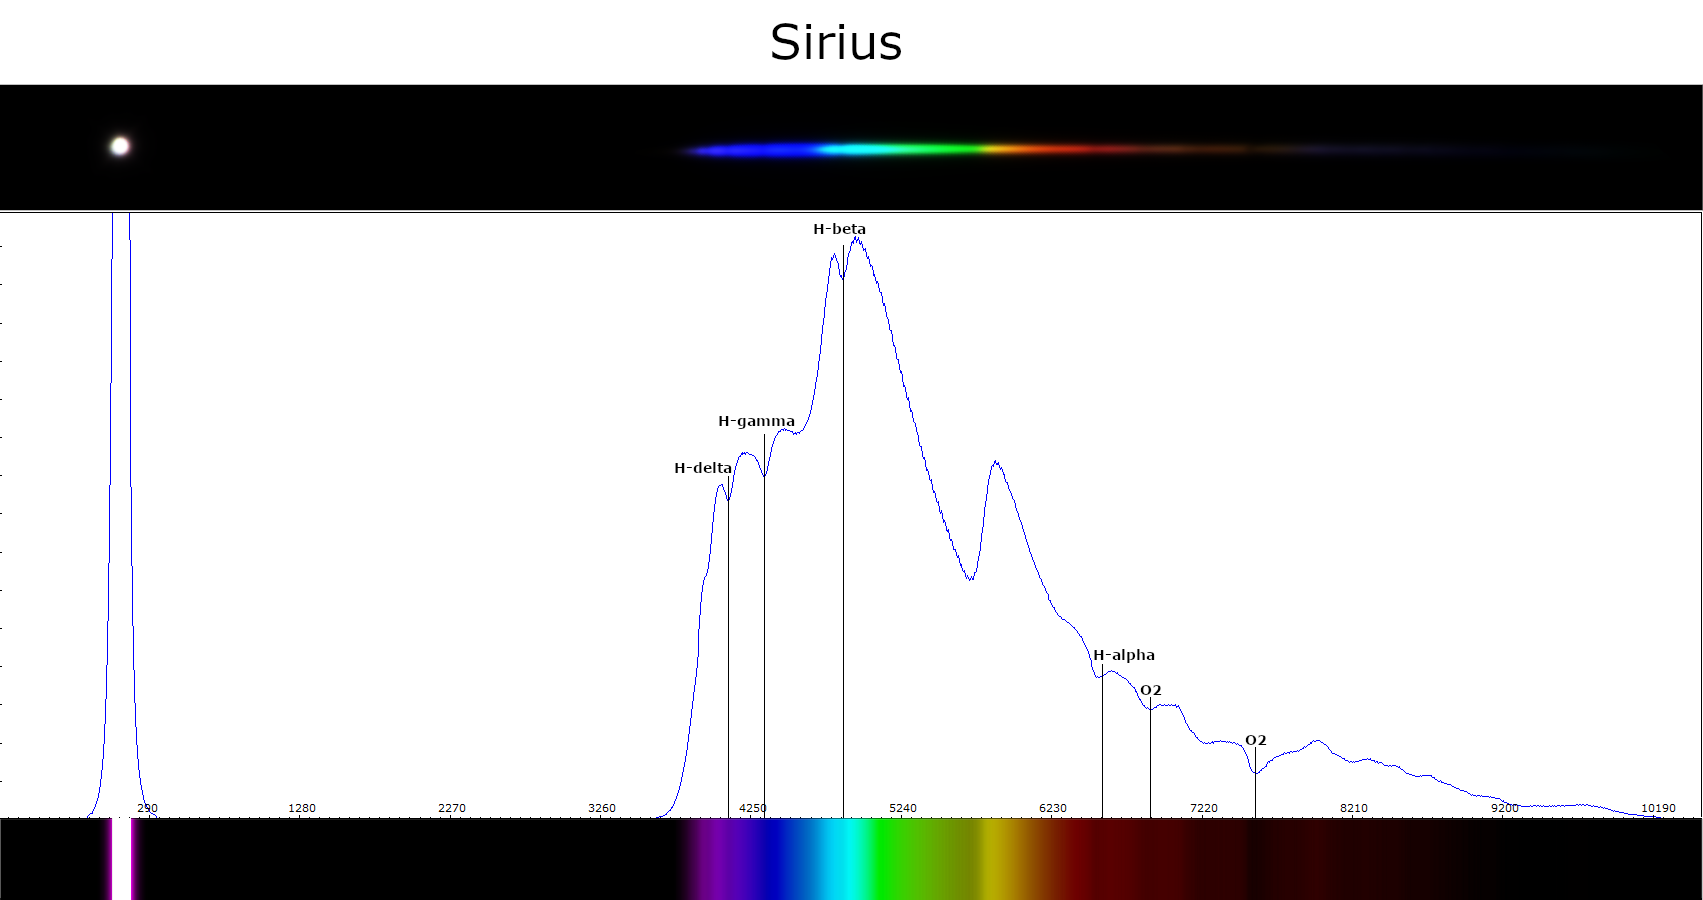 Sirius_analyse_Finale.png.b103ddf7c4b9d664765b4f24701f2538.png